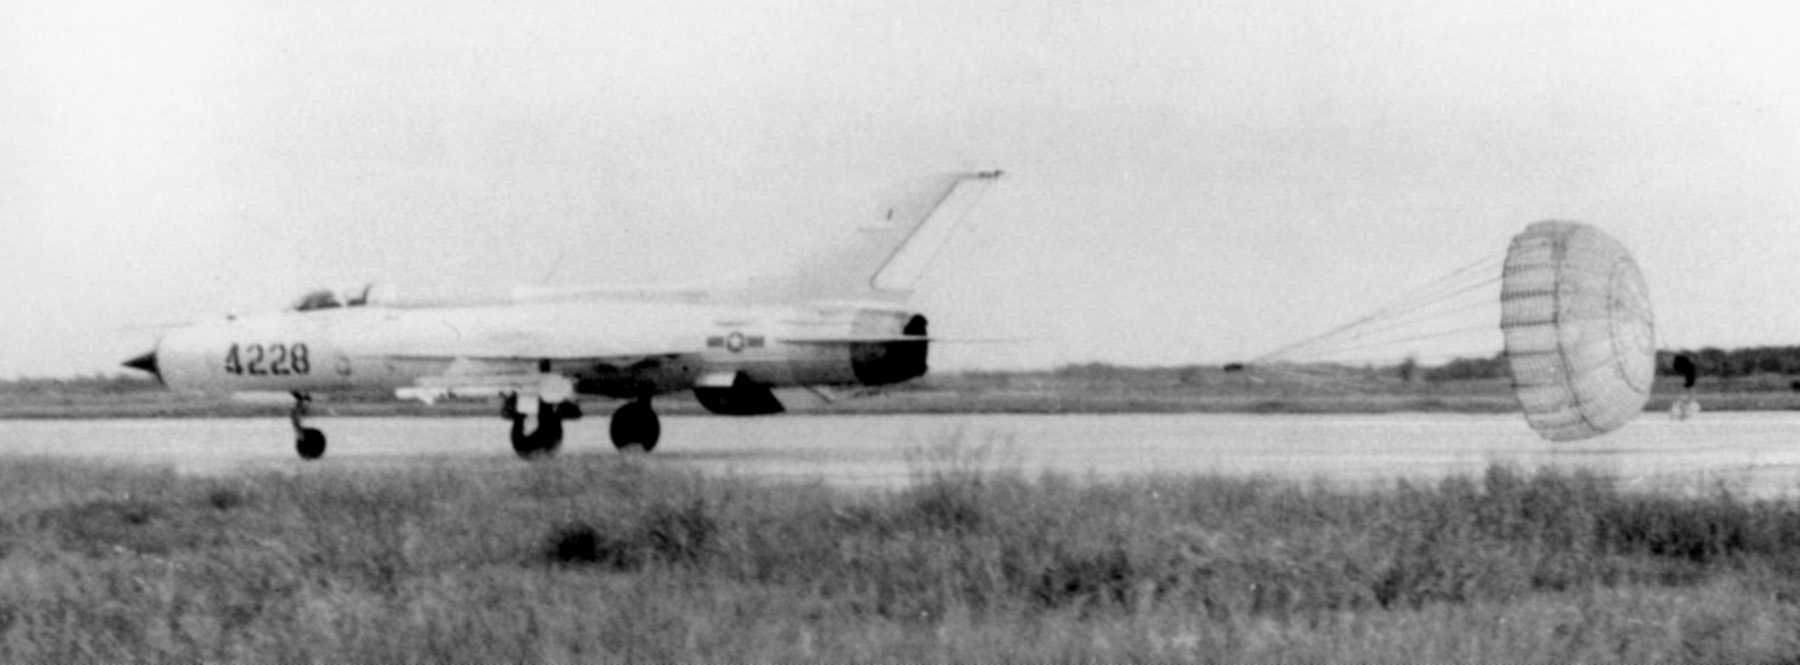 VPAF MiG-21 landing with chute.jpg